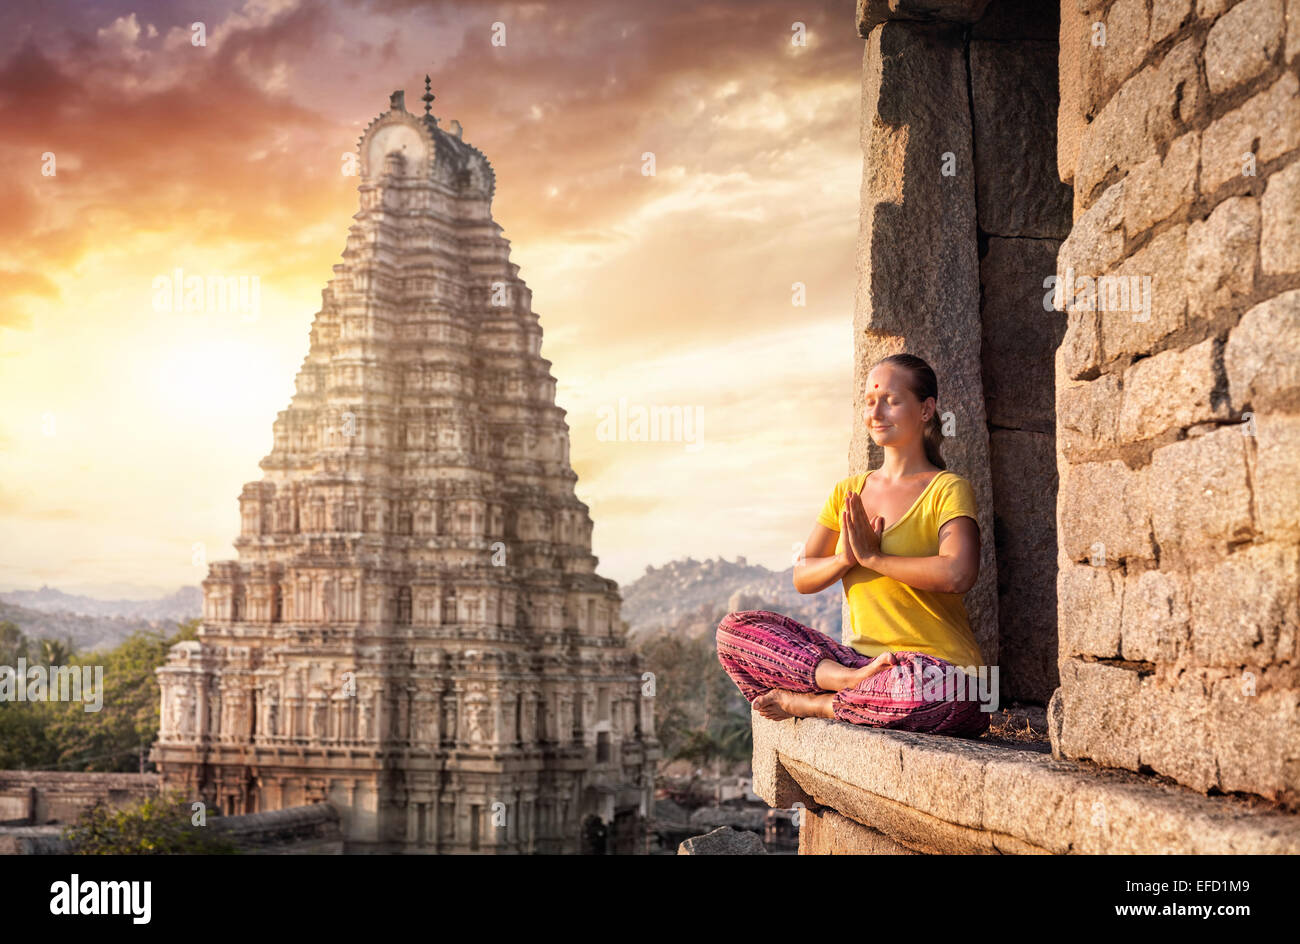 Mujer con Namaste mudra sentados cerca de templo Virupaksha en Hampi, Karnataka, India Imagen De Stock